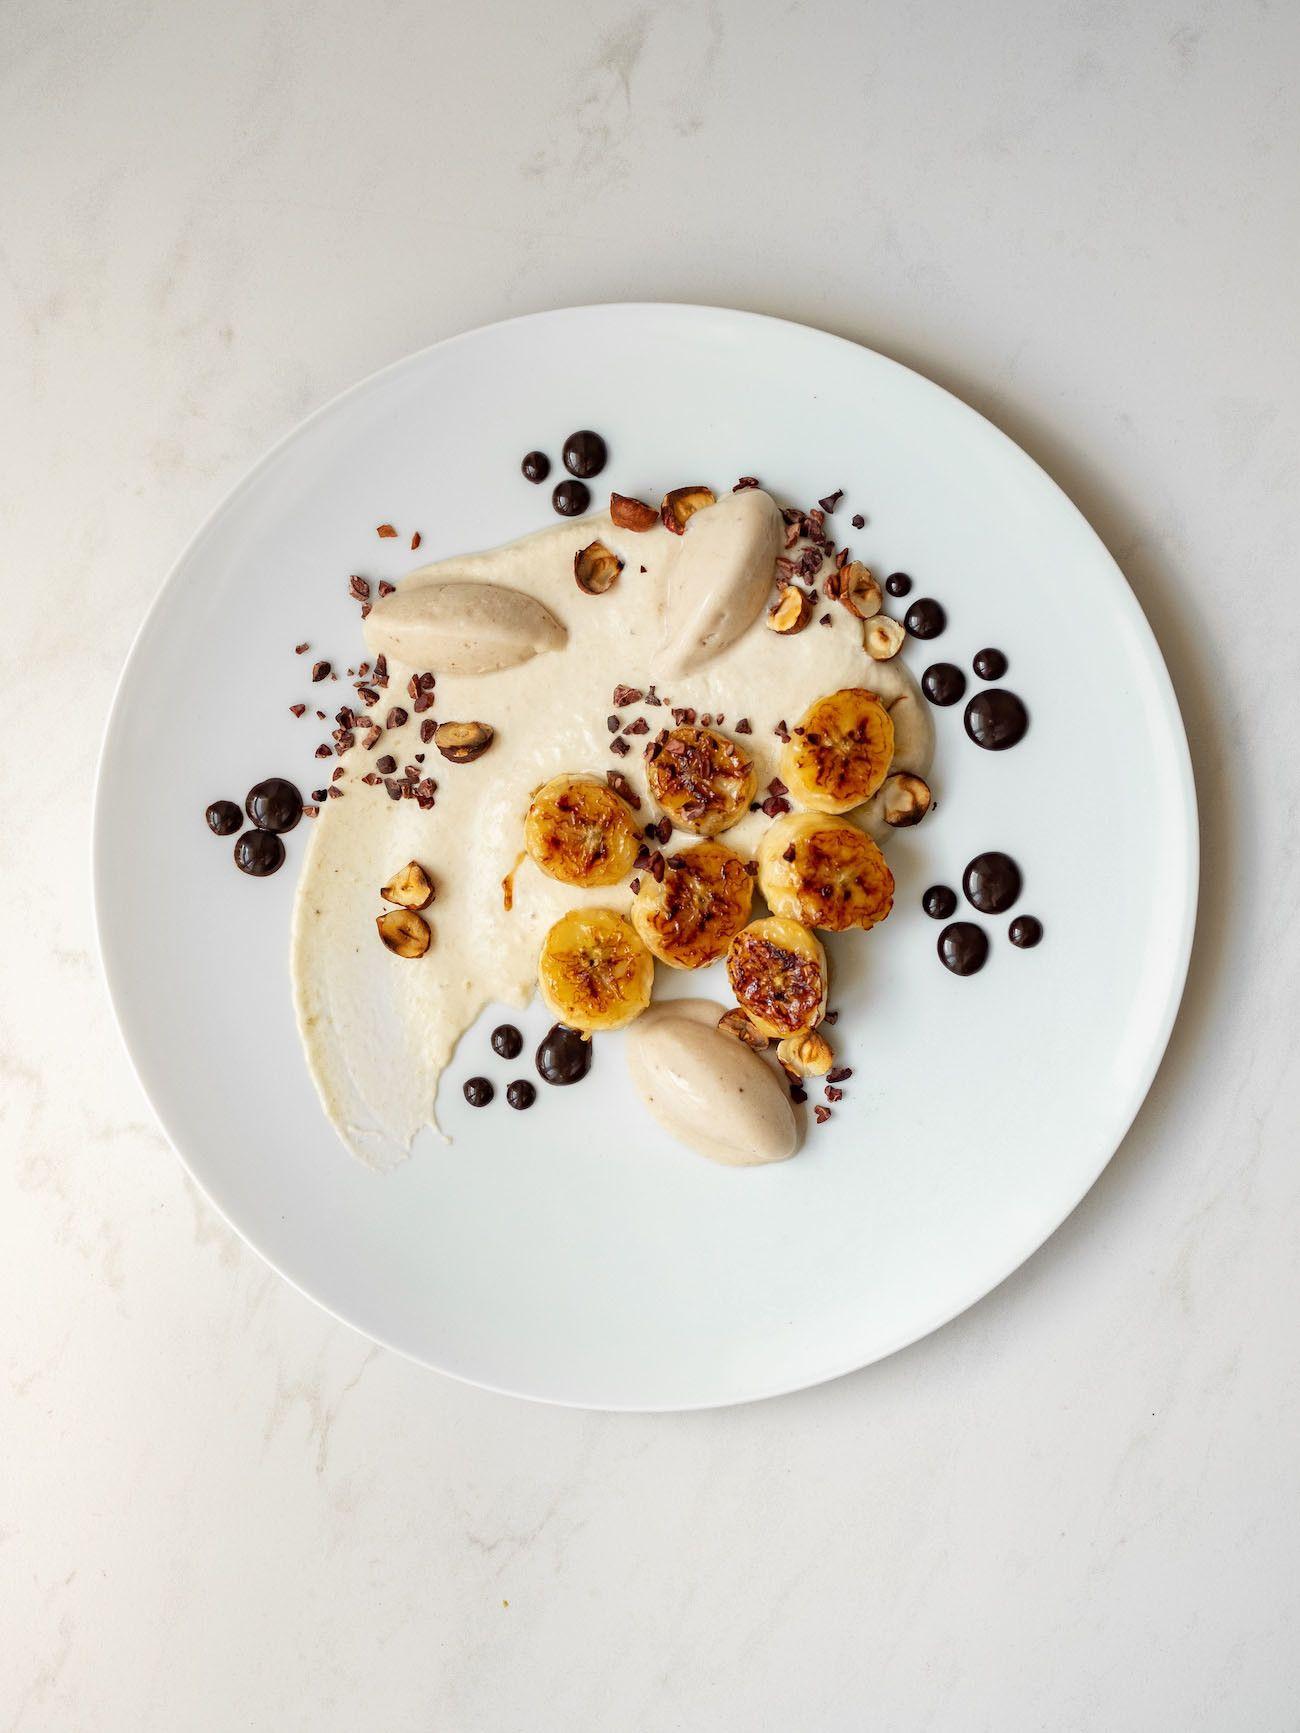 Foodblog, About Fuel, Rezept, Banane, Rum Schokolade, Haselnuss